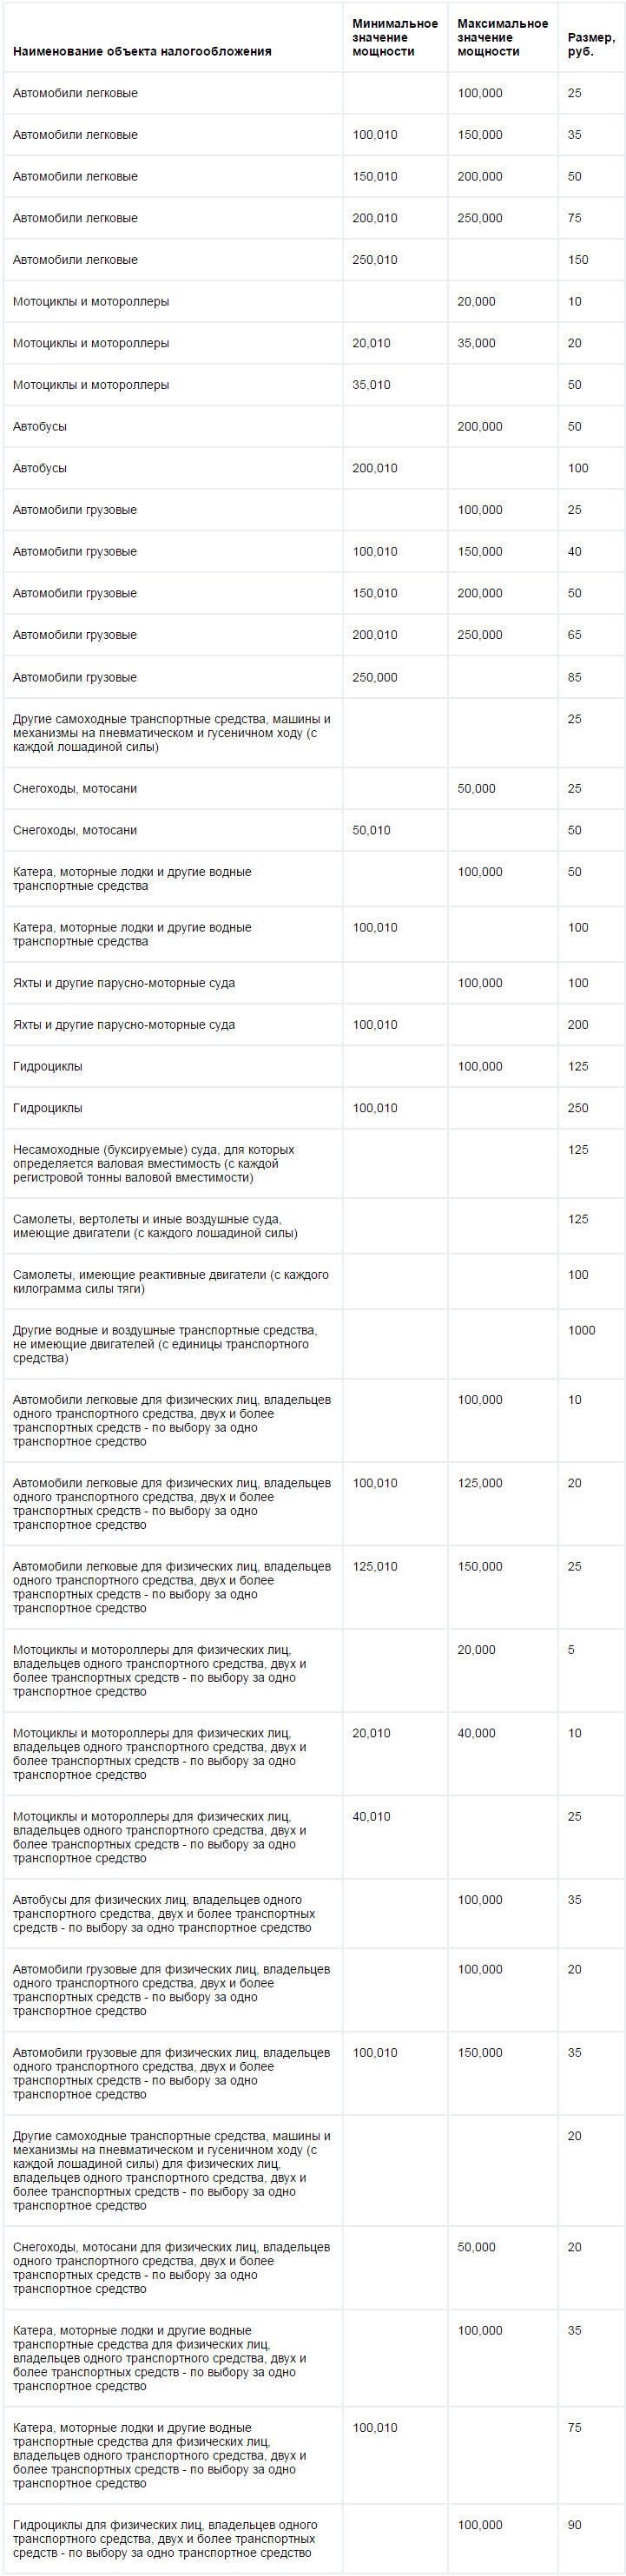 Ставки налога на транспорт в башкортостане заработать деньги в интернете на лайках в вк